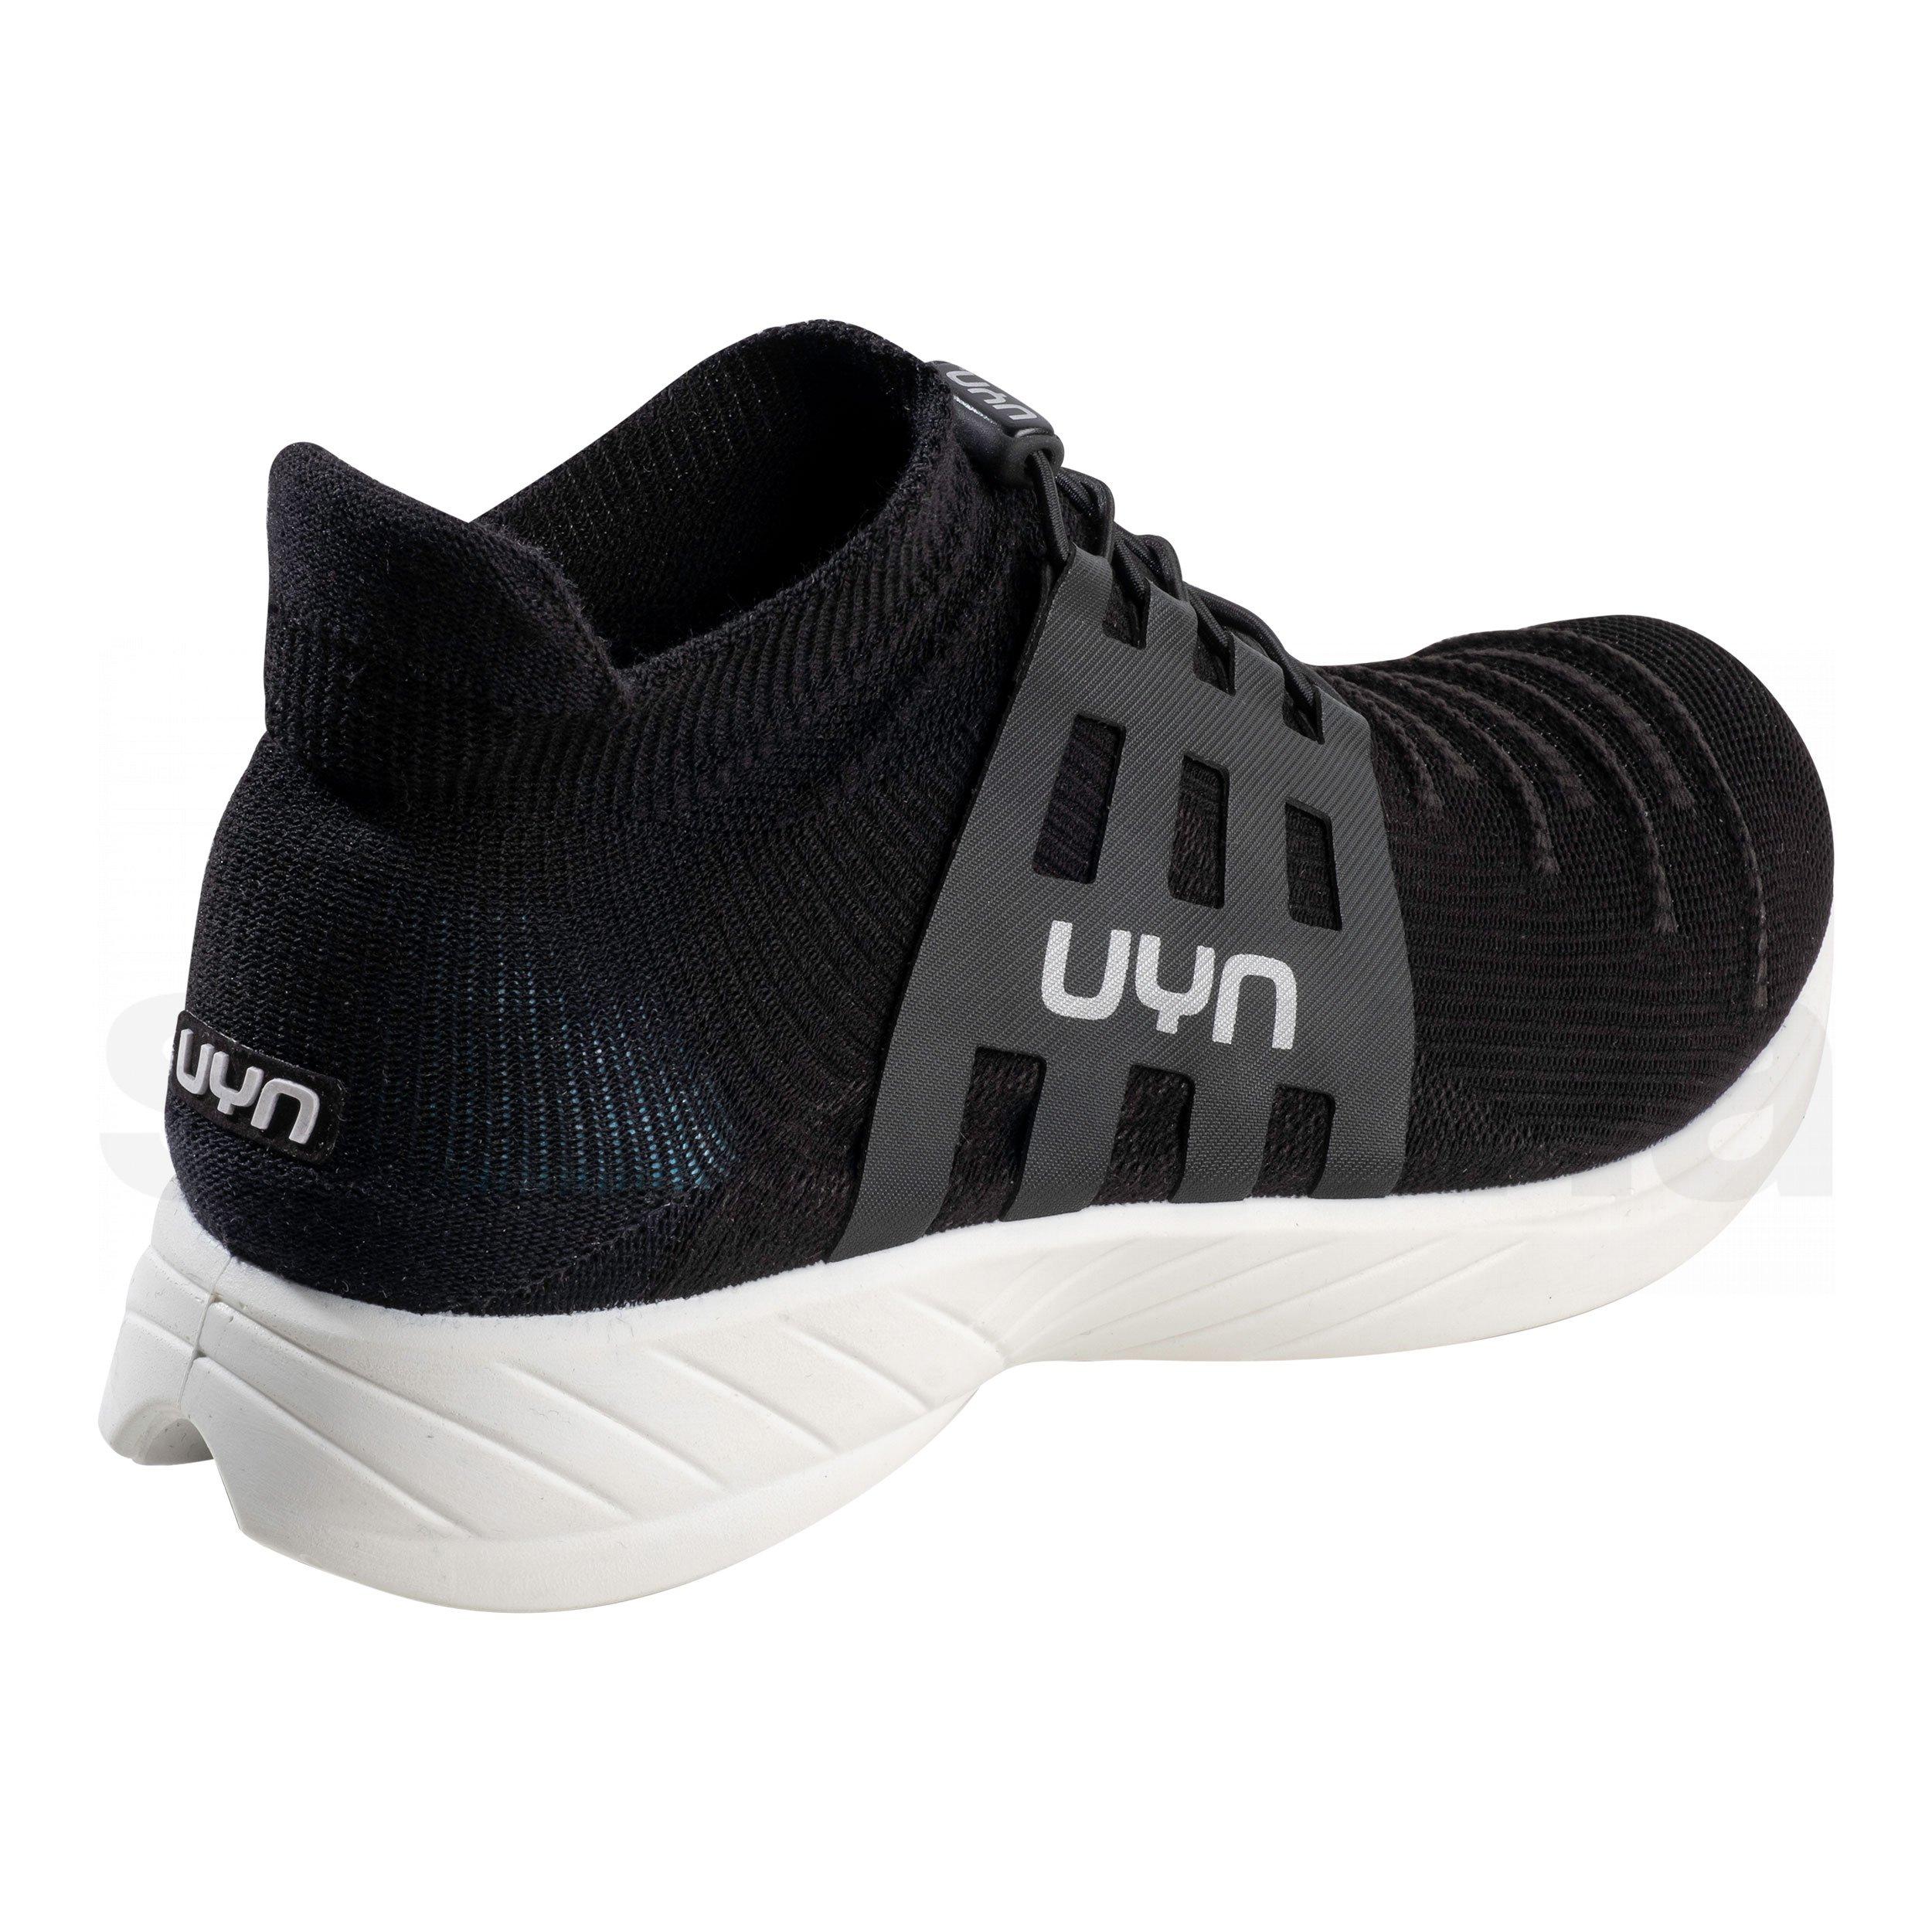 Obuv UYN X-Cross Tune Shoes M - černá/bílá